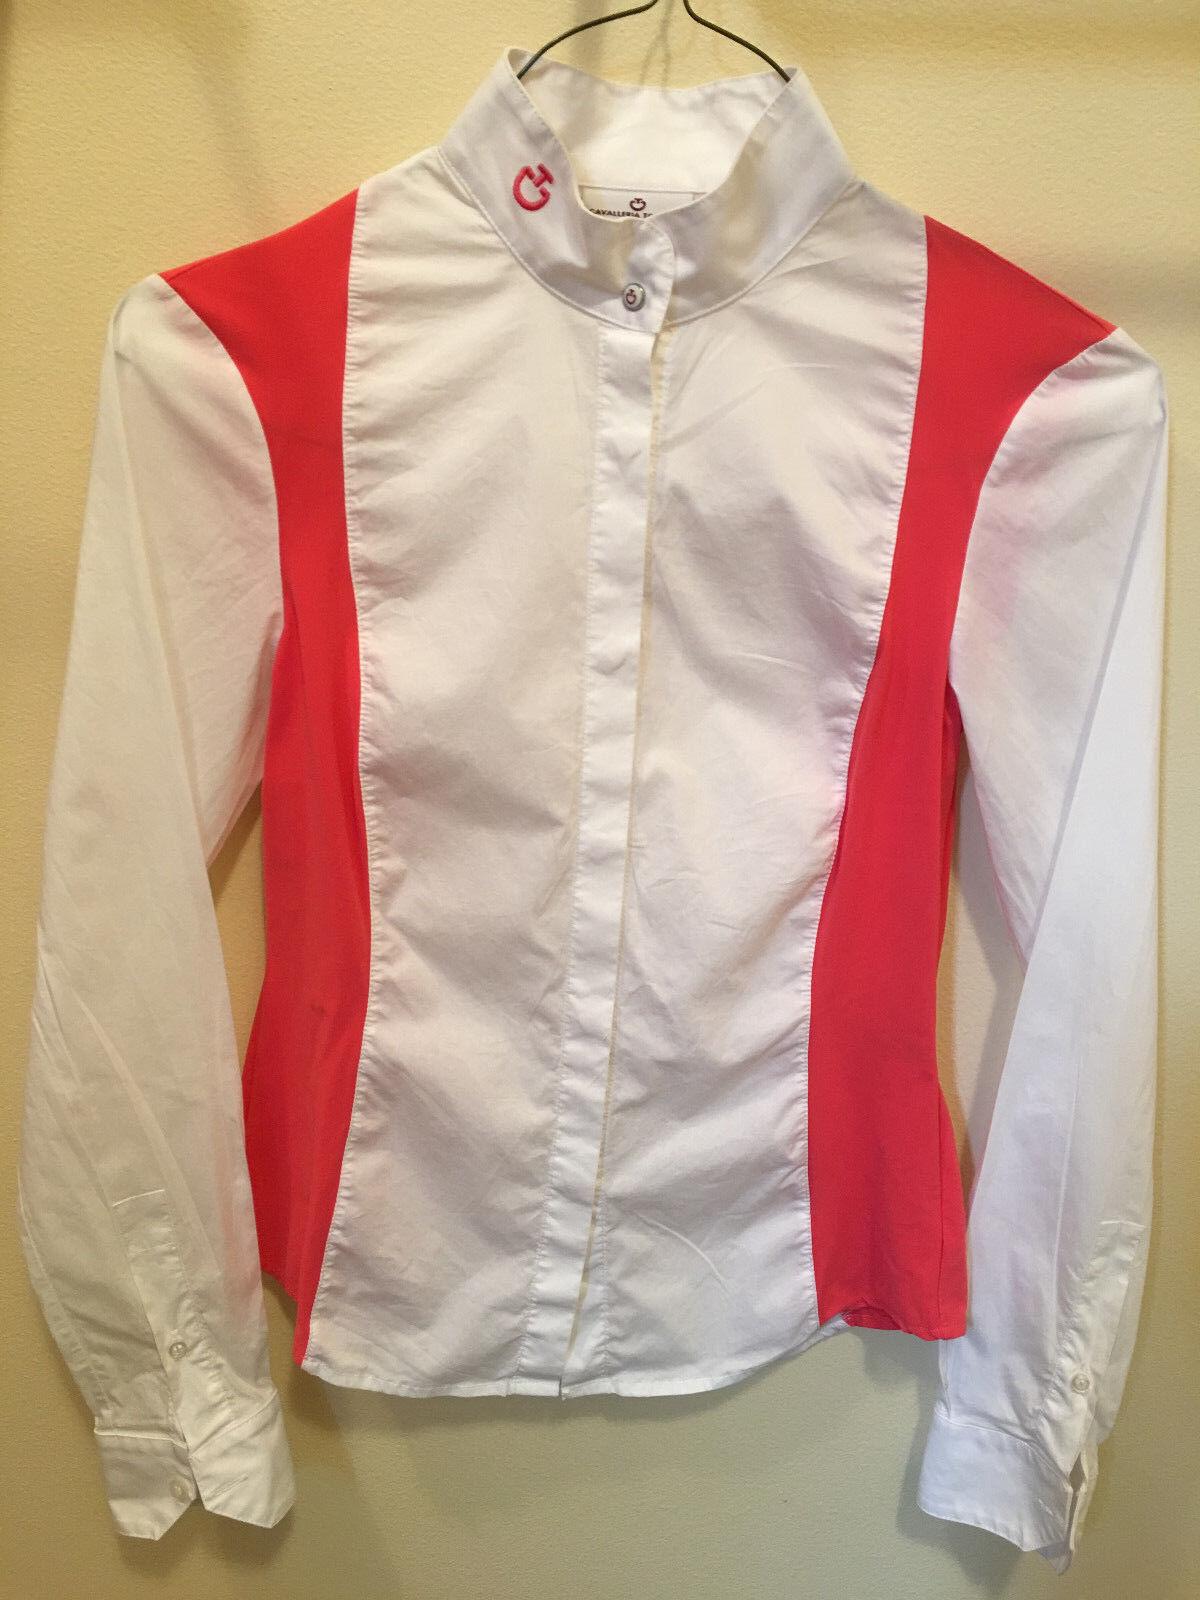 Cavalleria Toscana Show Shirt  - Small  on sale 70% off